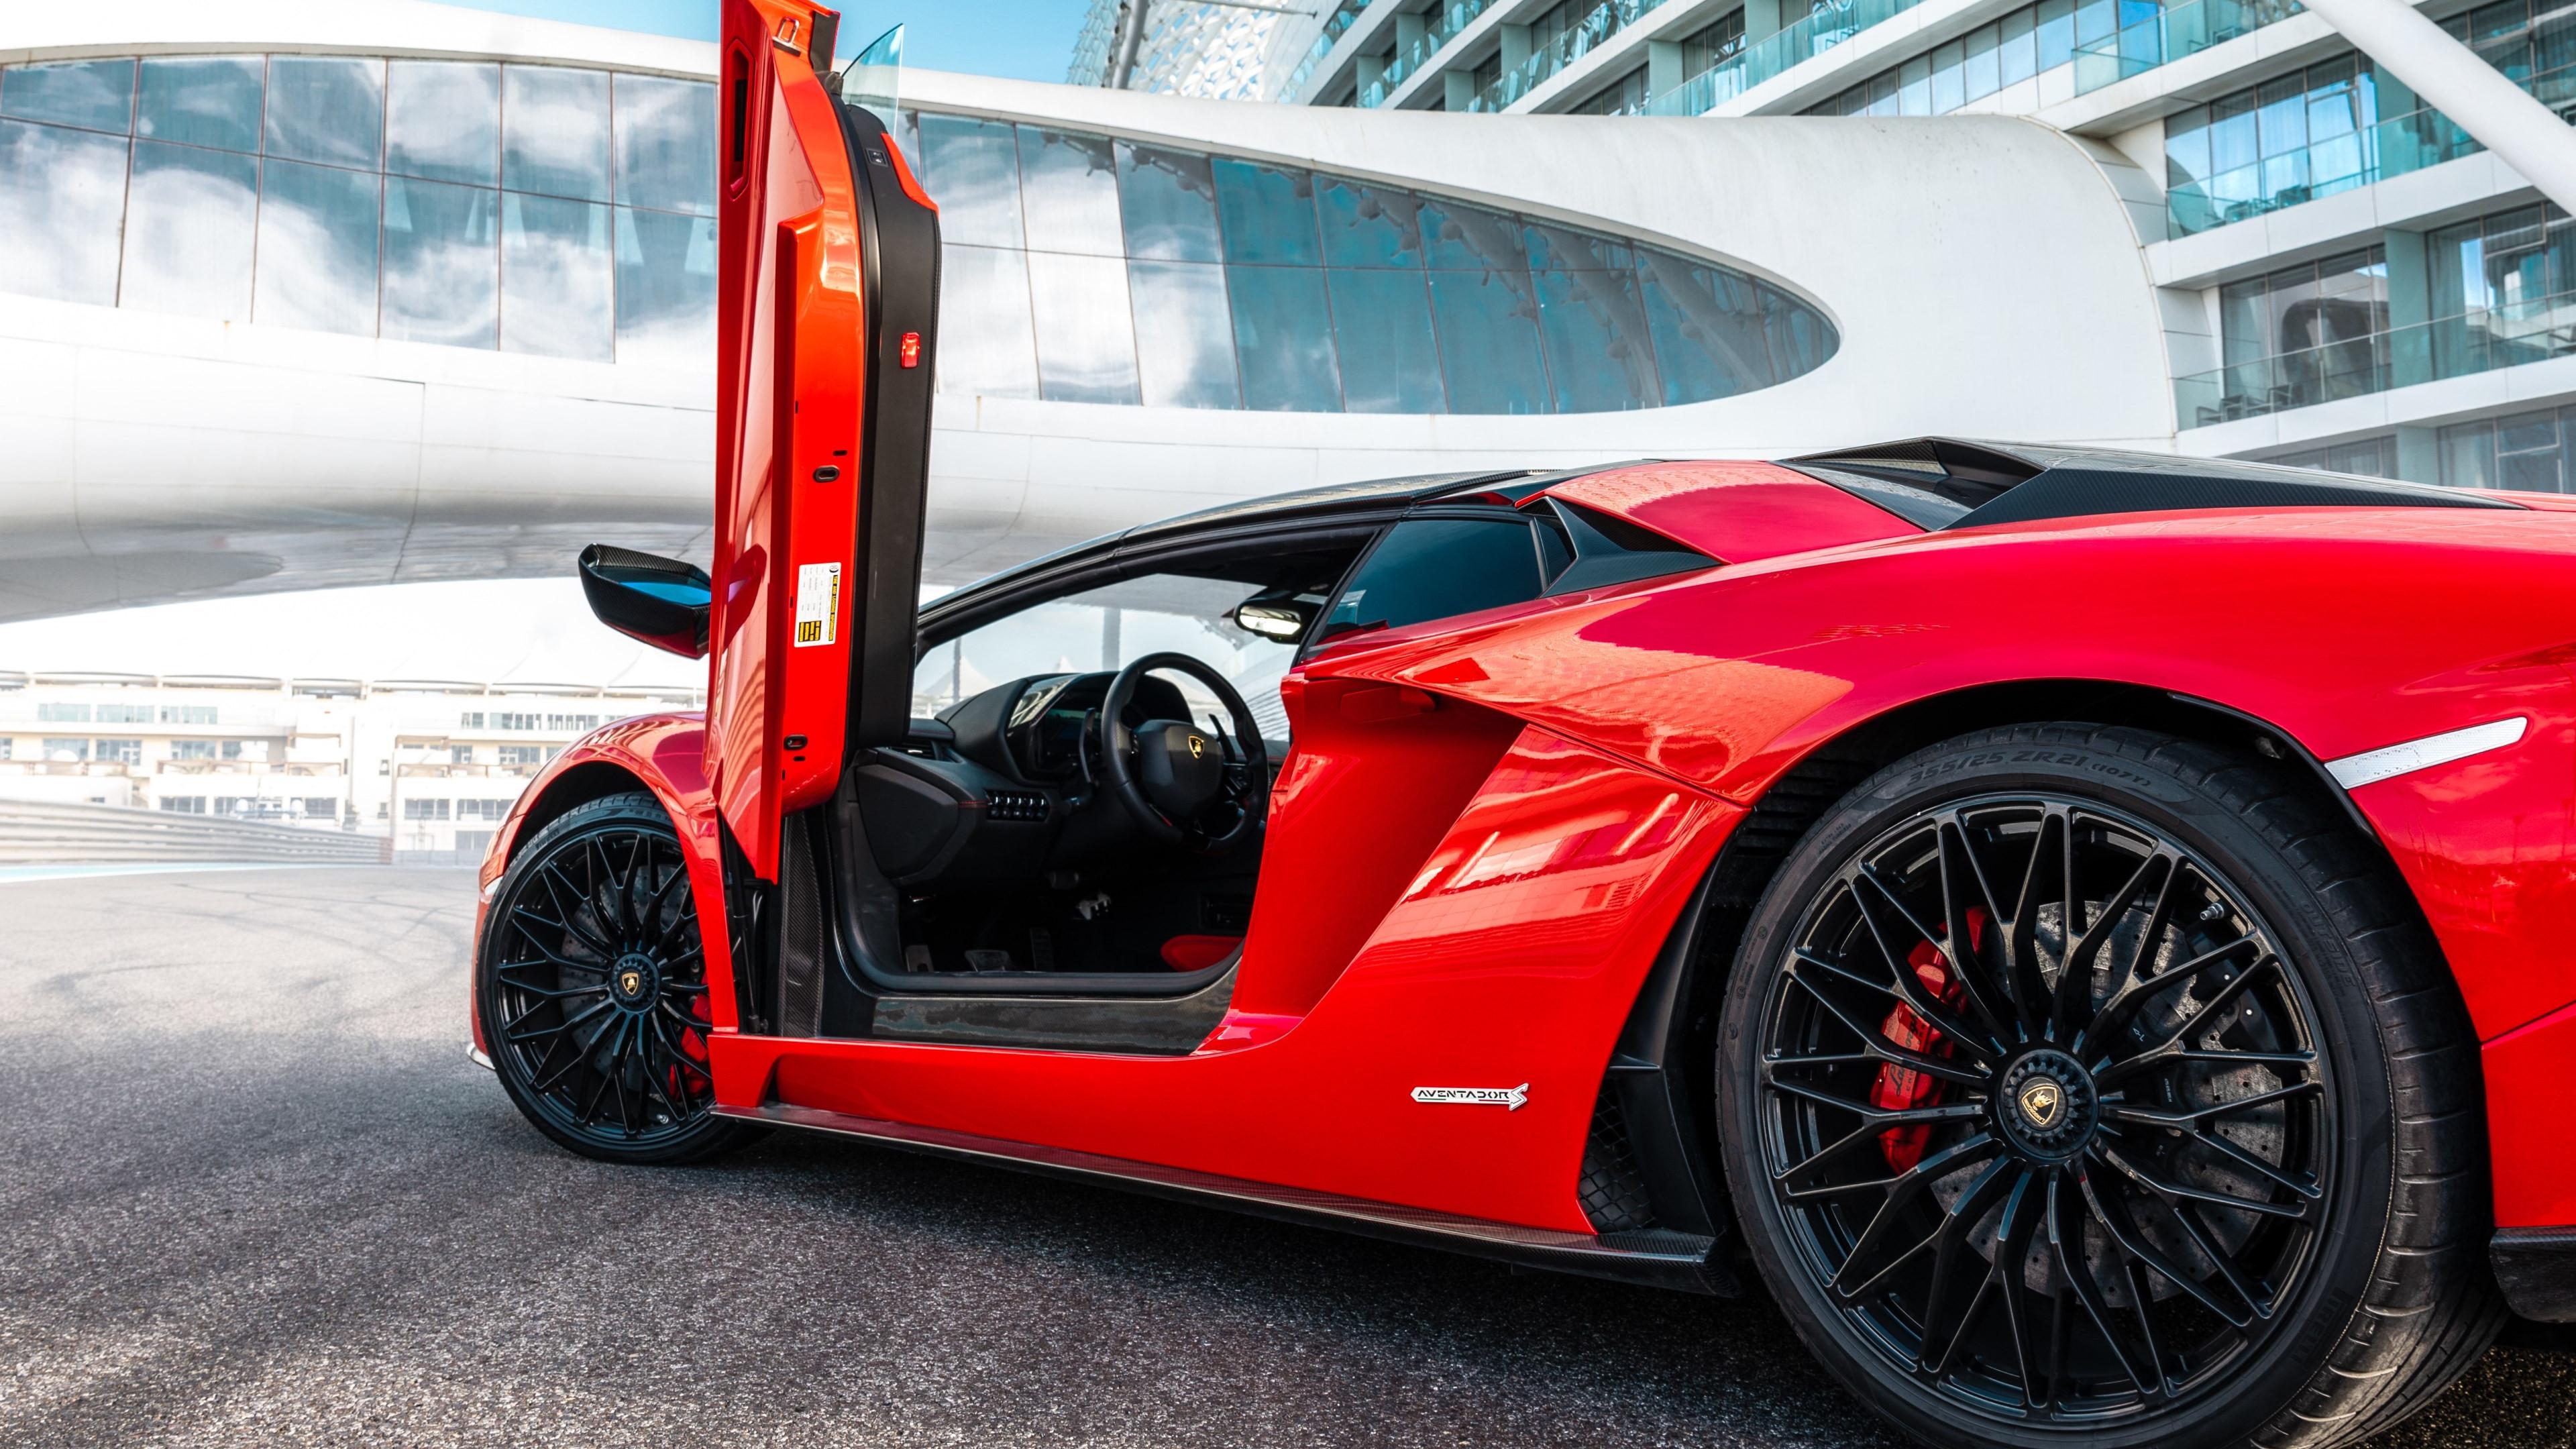 Download Wallpaper Lamborghini Aventador S Roadster 3840x2160